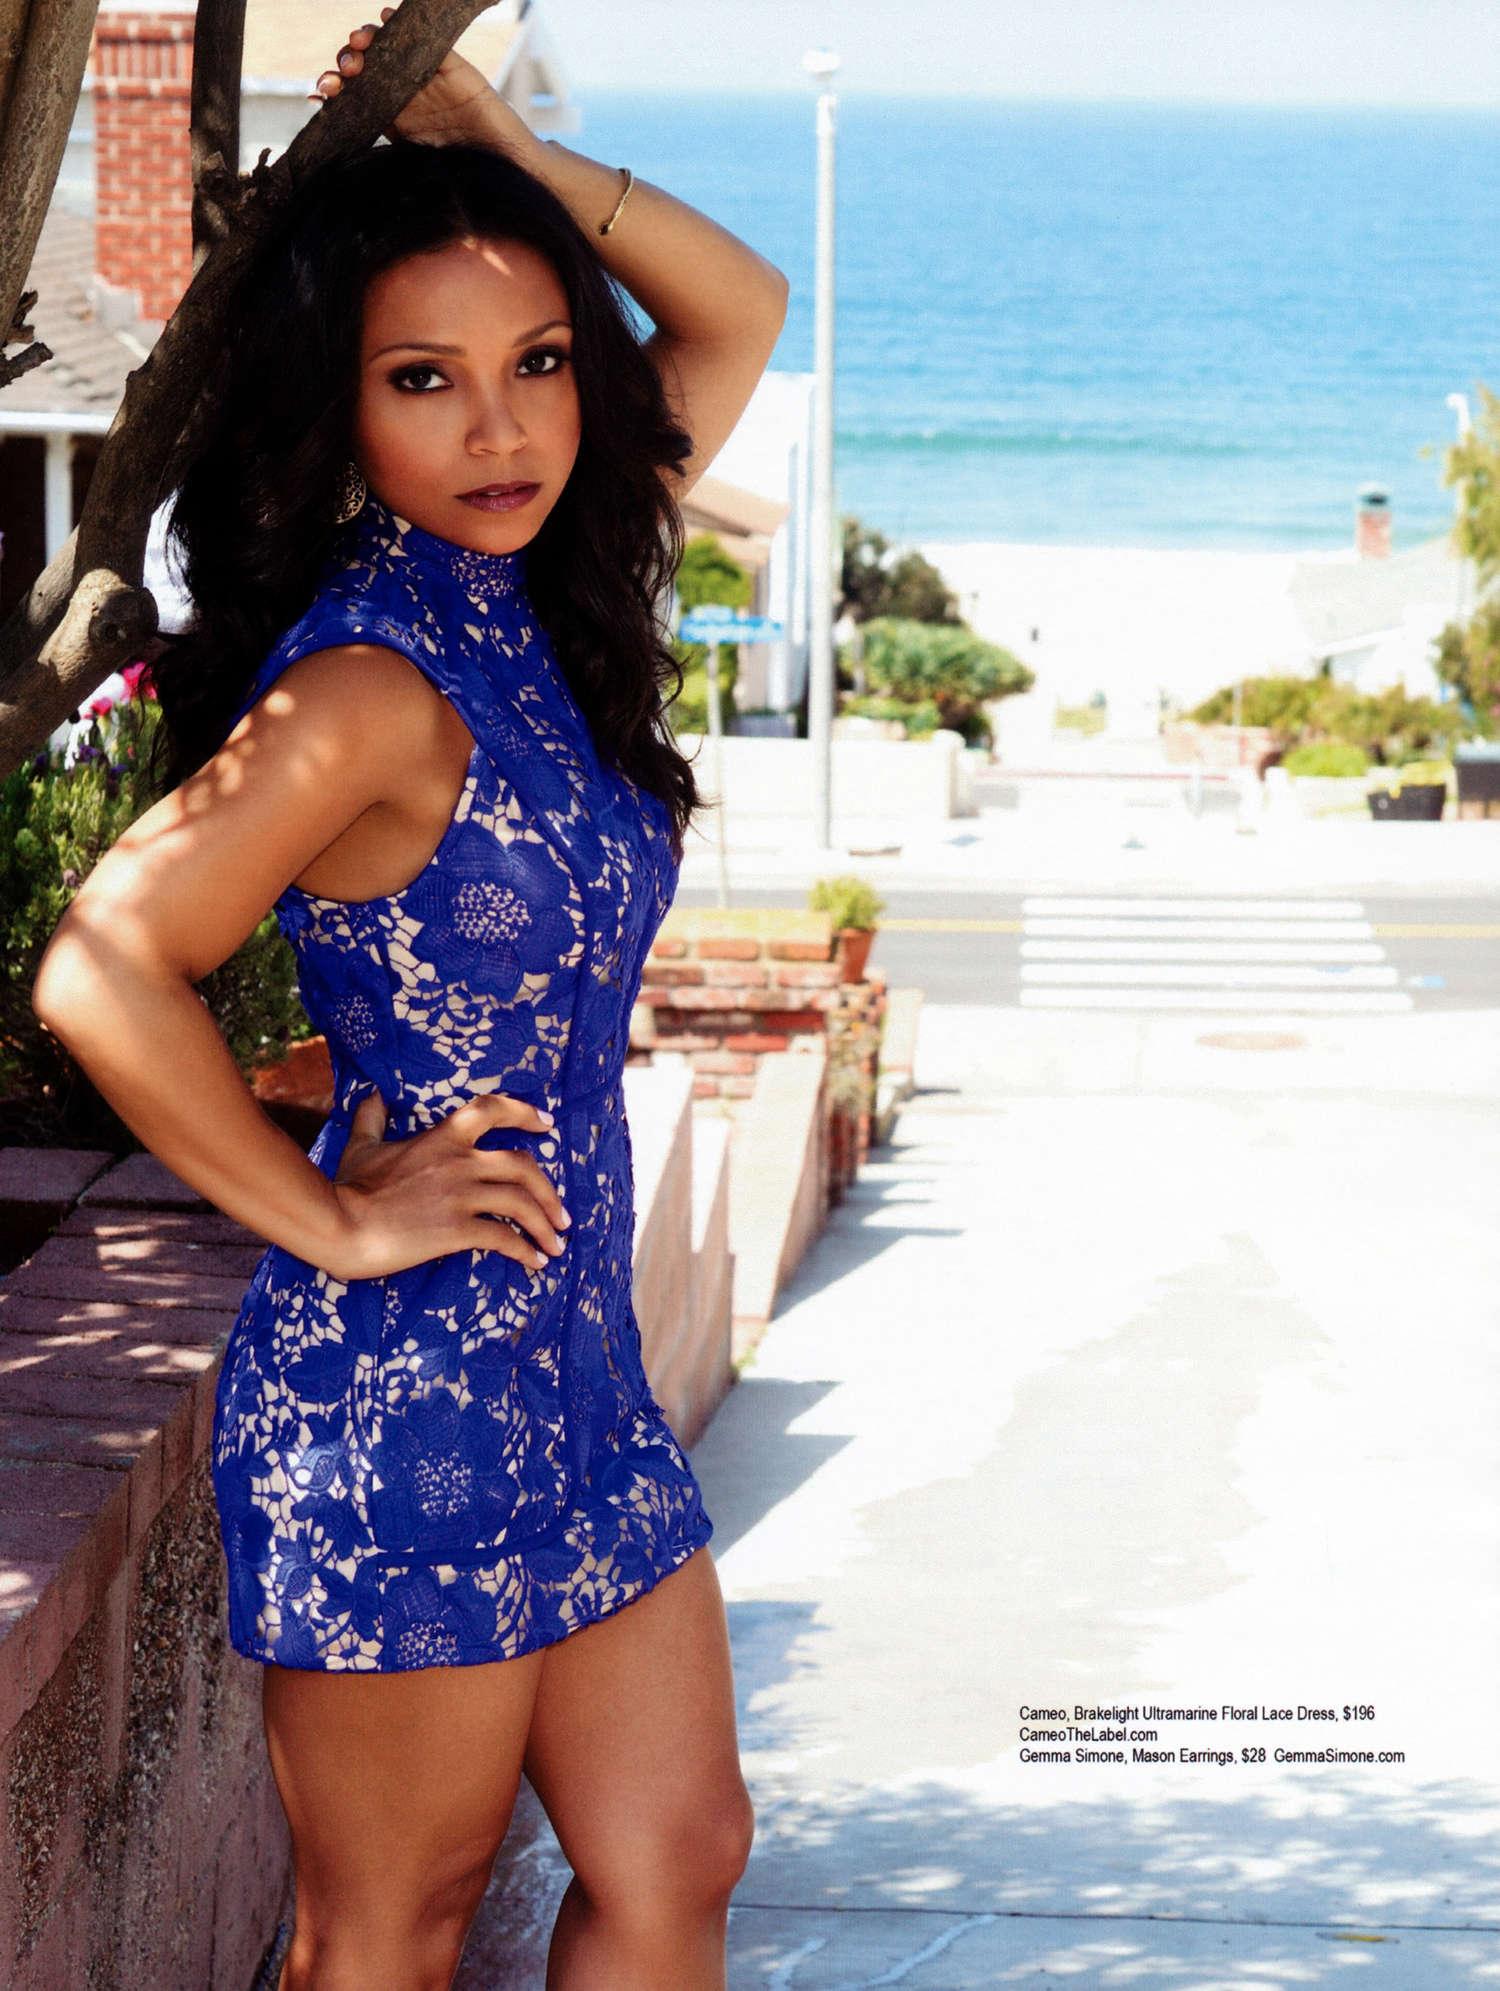 Danielle nicolet hot